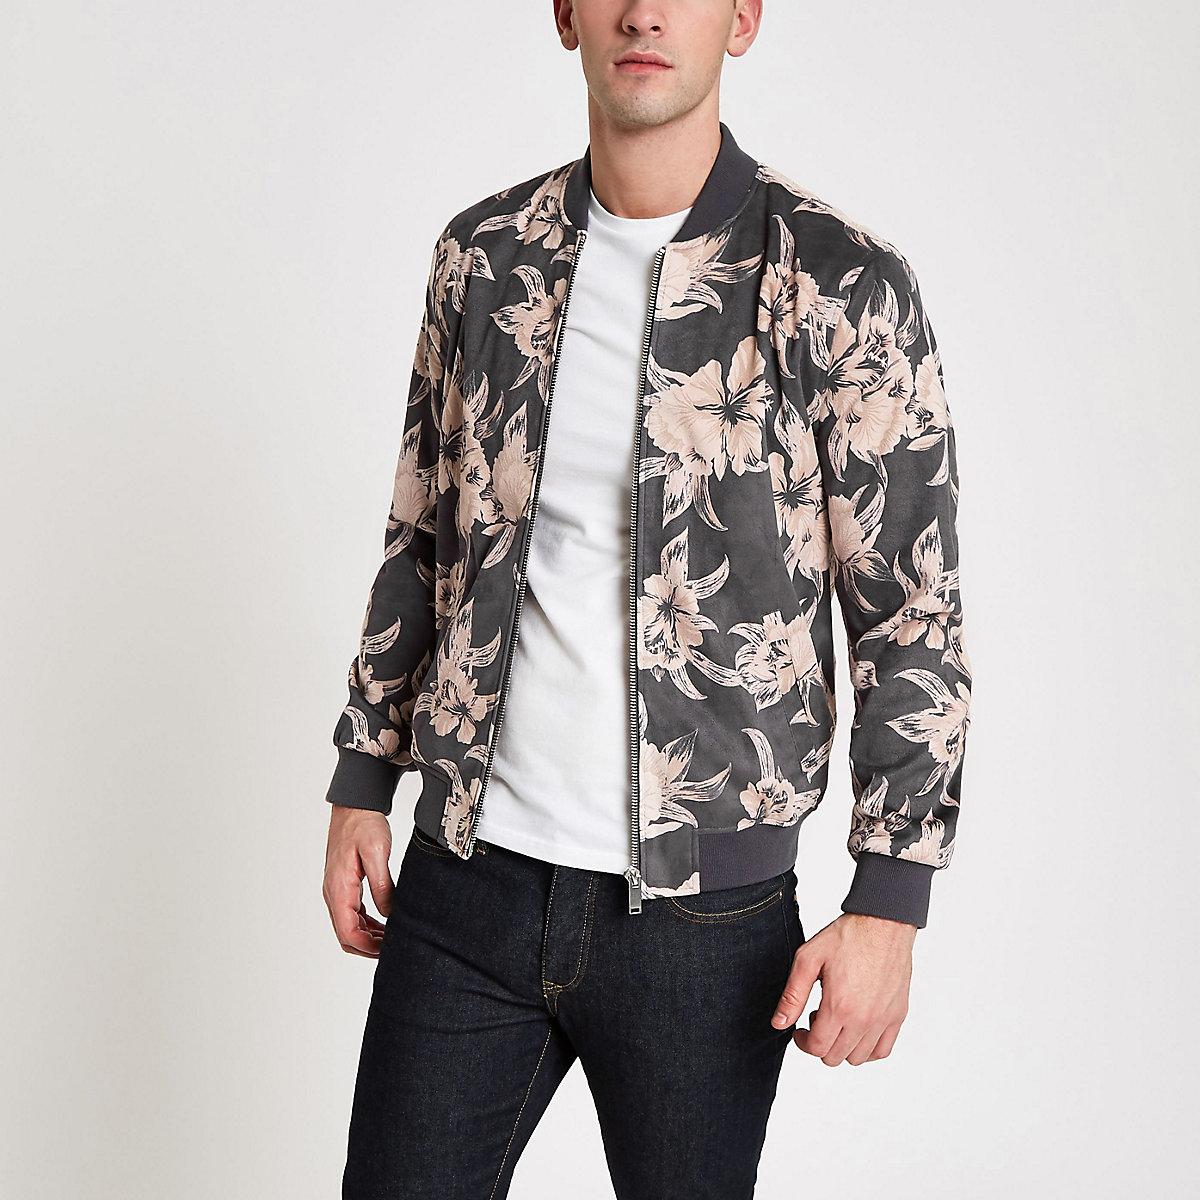 Grey floral faux suede bomber jacket